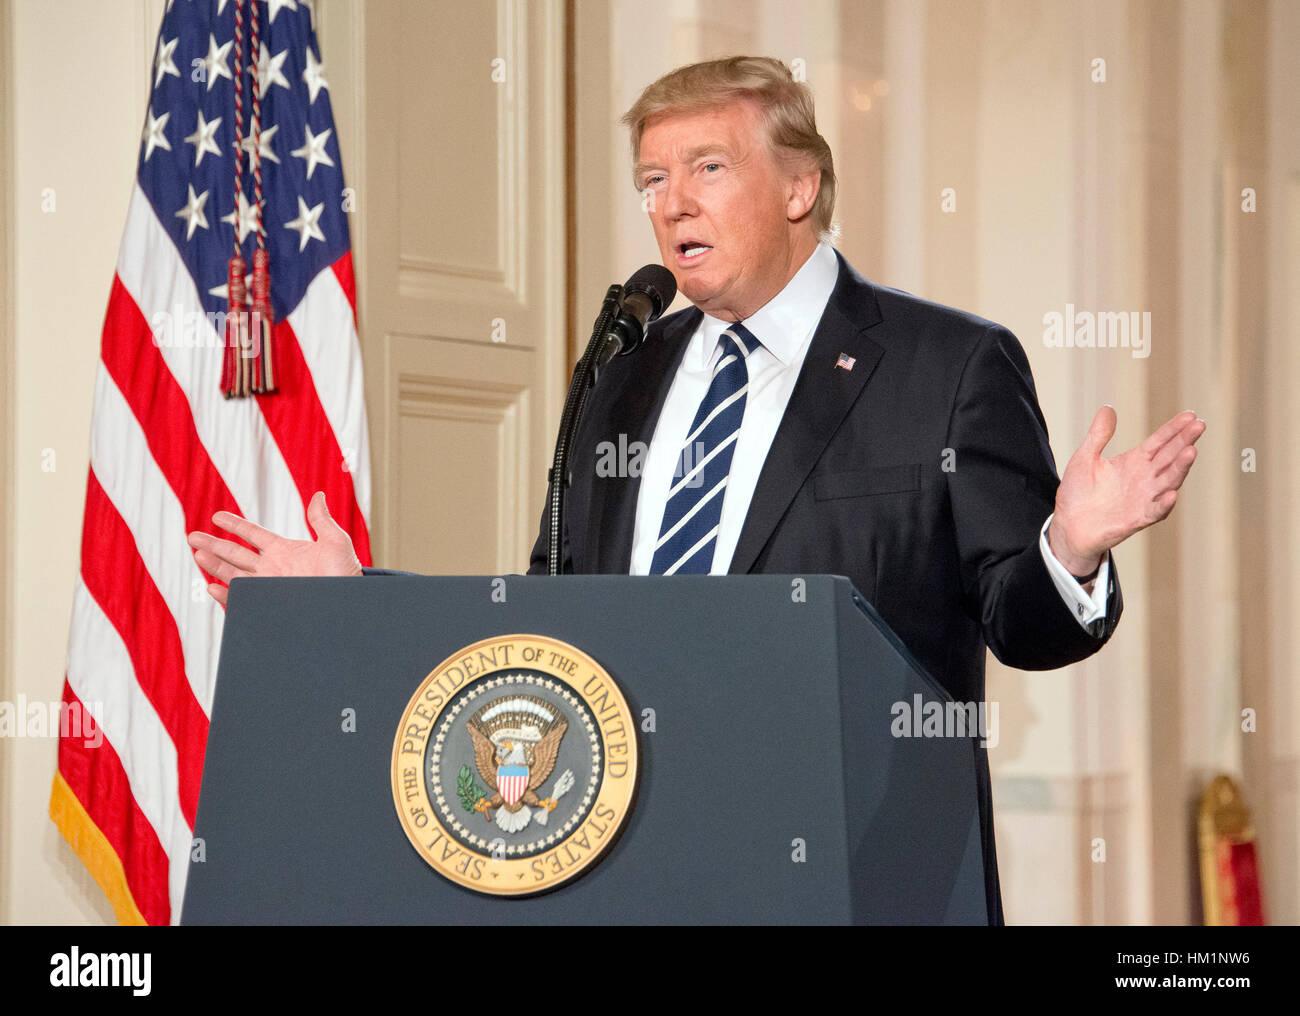 Washington, Estados Unidos. 31 ene, 2017. El Presidente de Estados Unidos, Donald J. Trump anuncia N. Gorsuch como Imagen De Stock